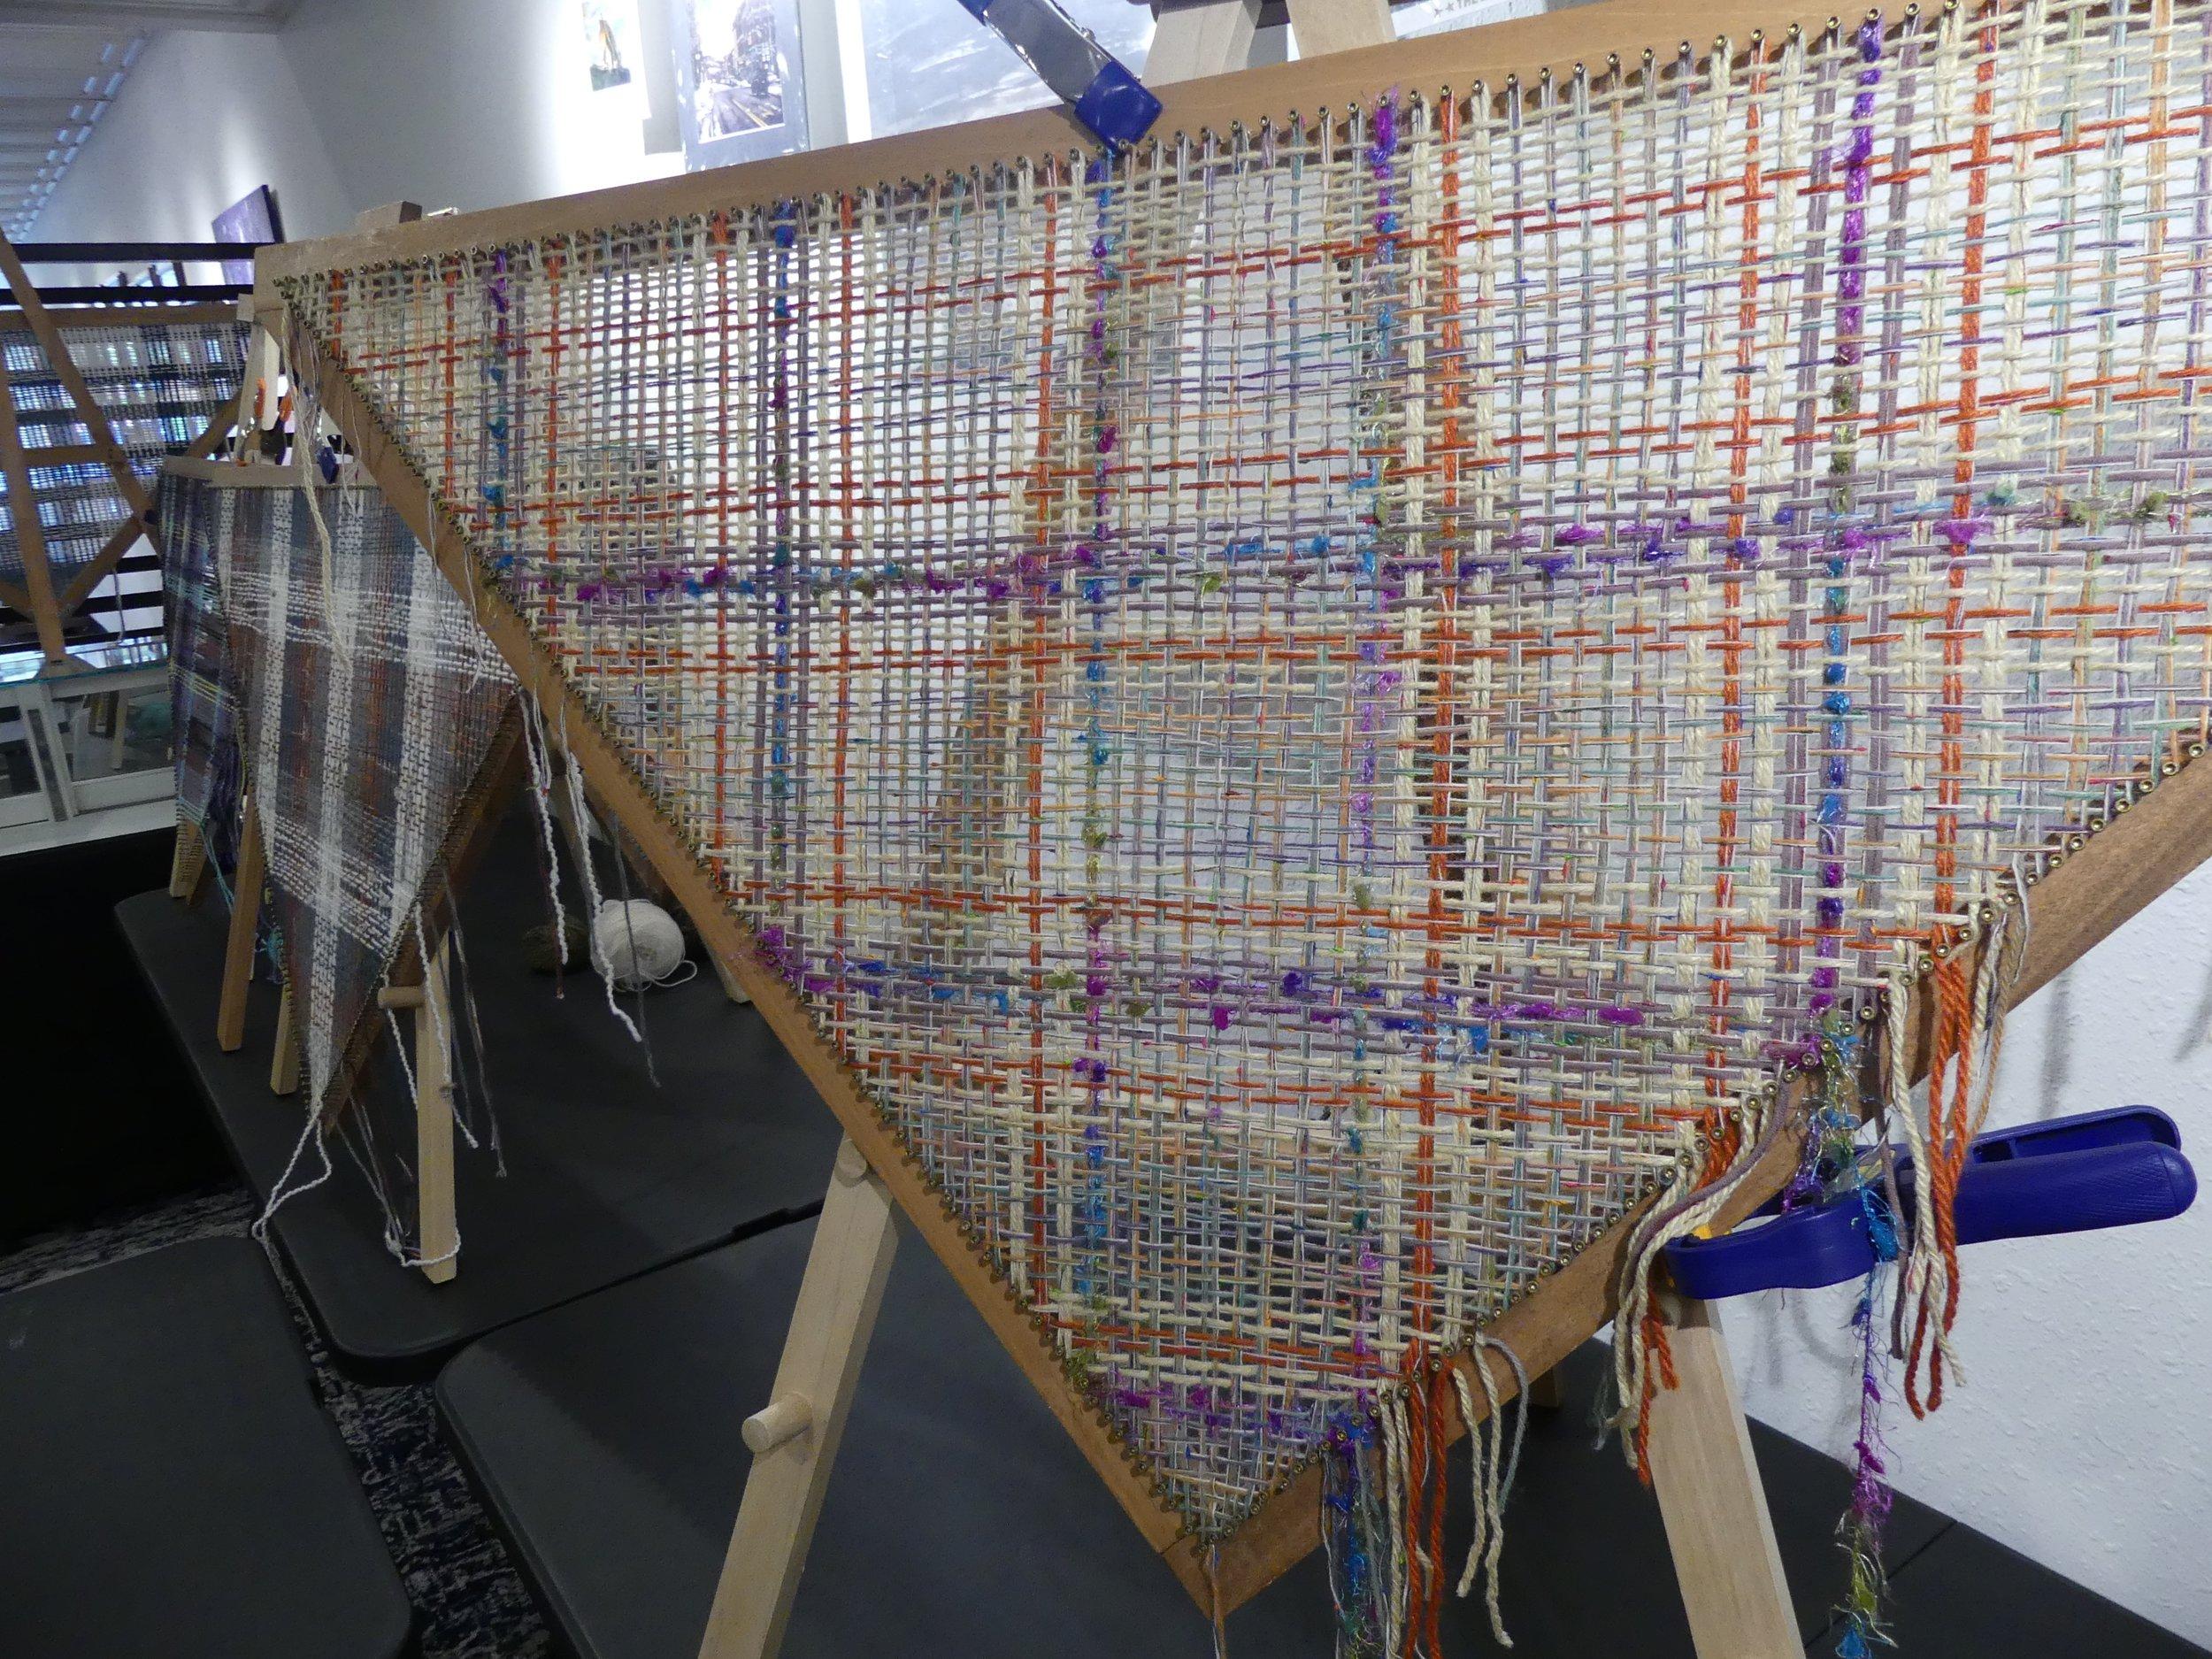 Wraps in progress on a triangle loom.